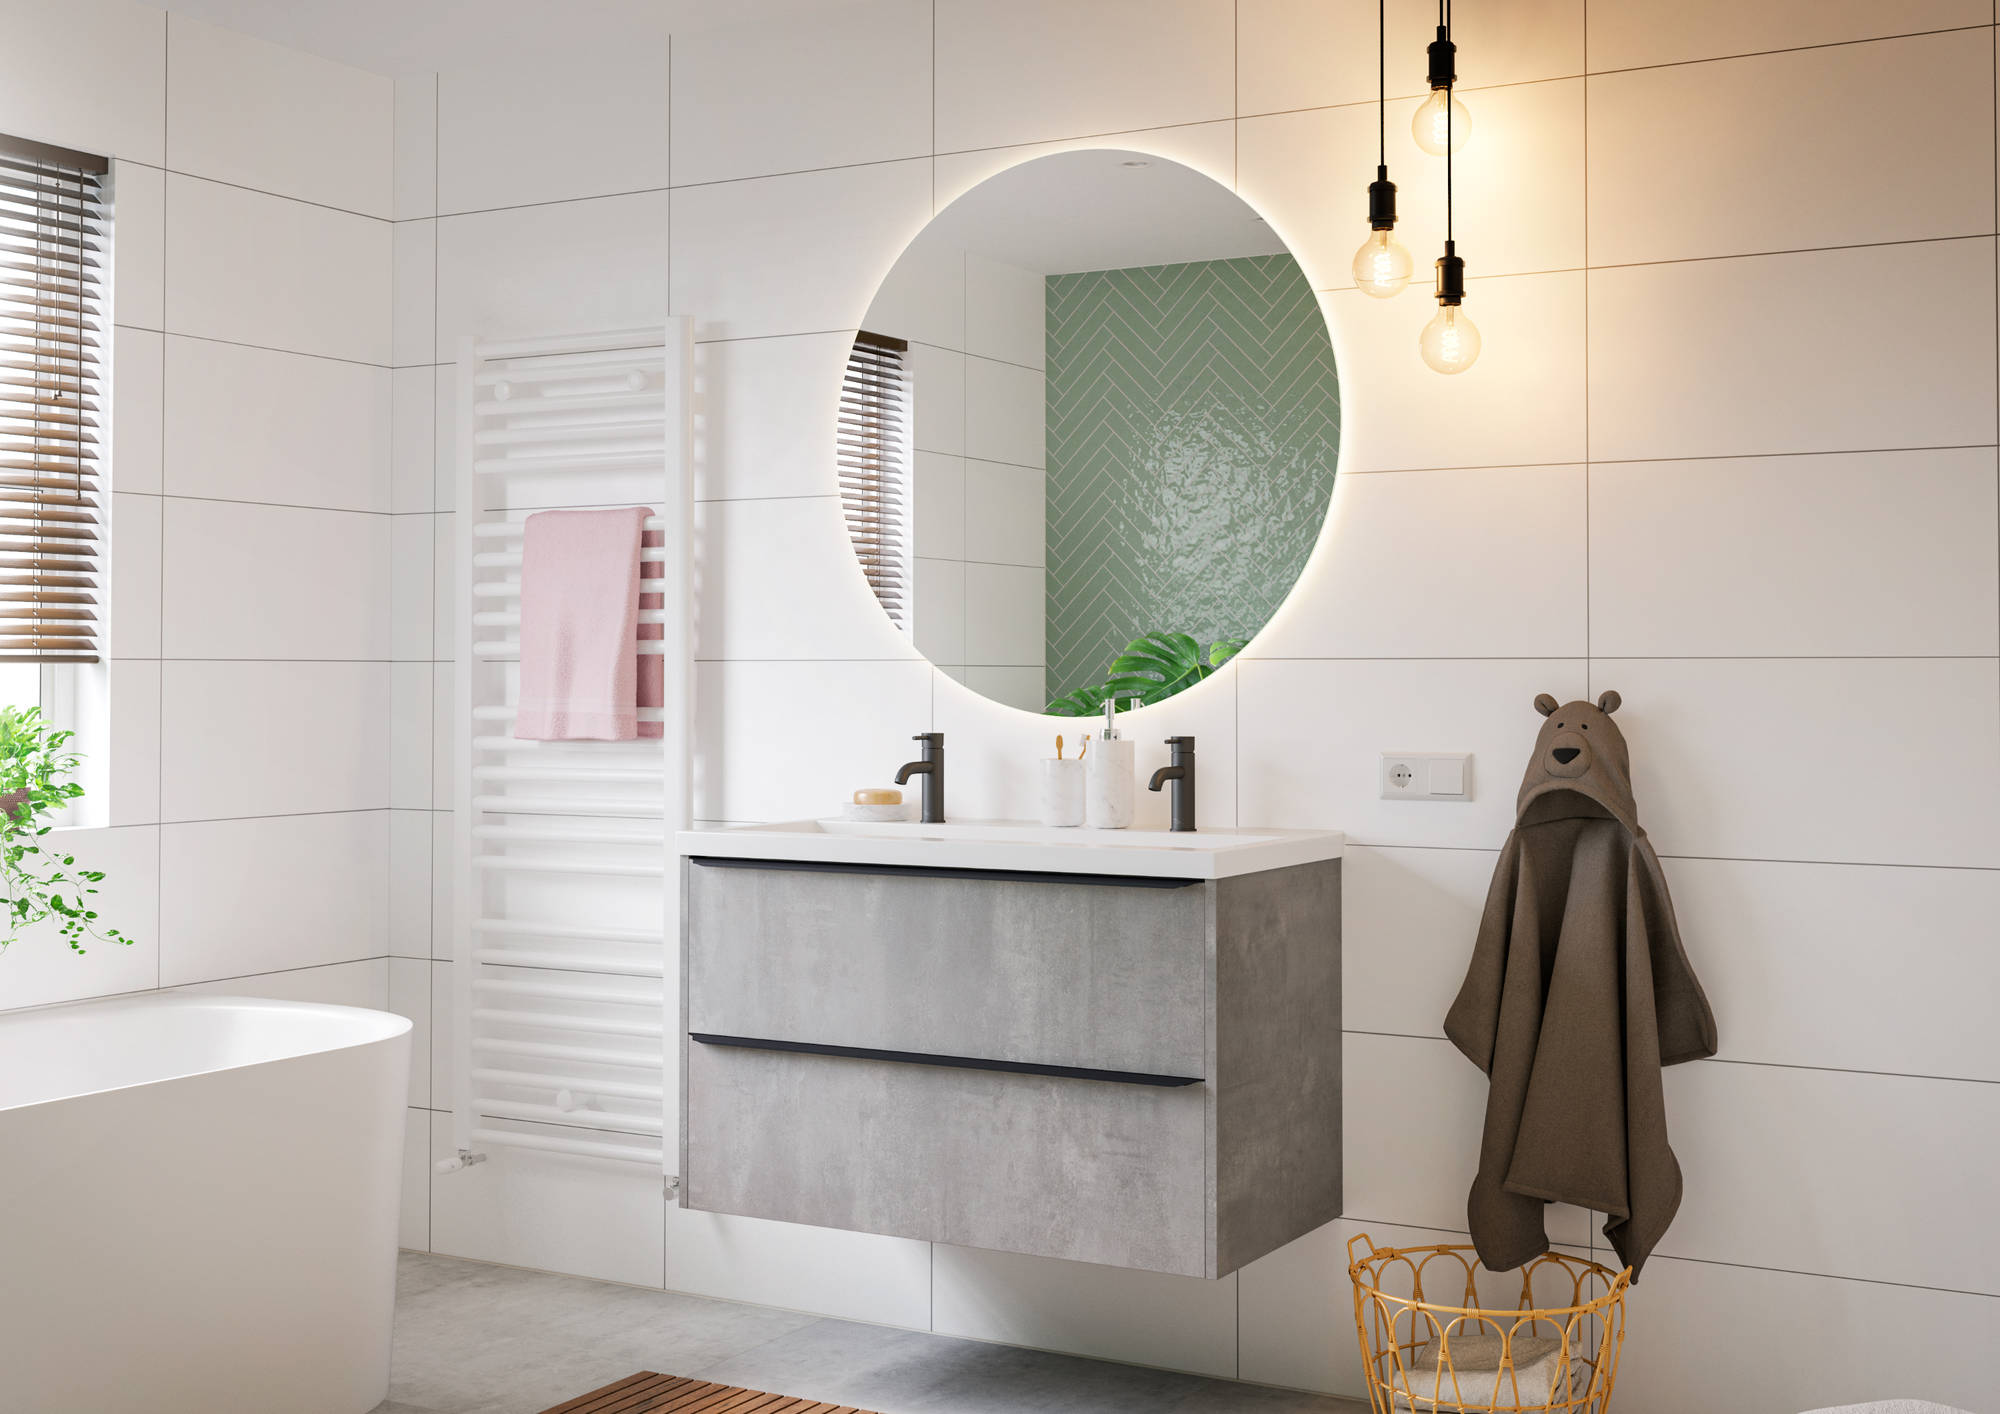 Saniselect Socan Wastafelonderkast 120x39,5x60 cm Beton Grijs